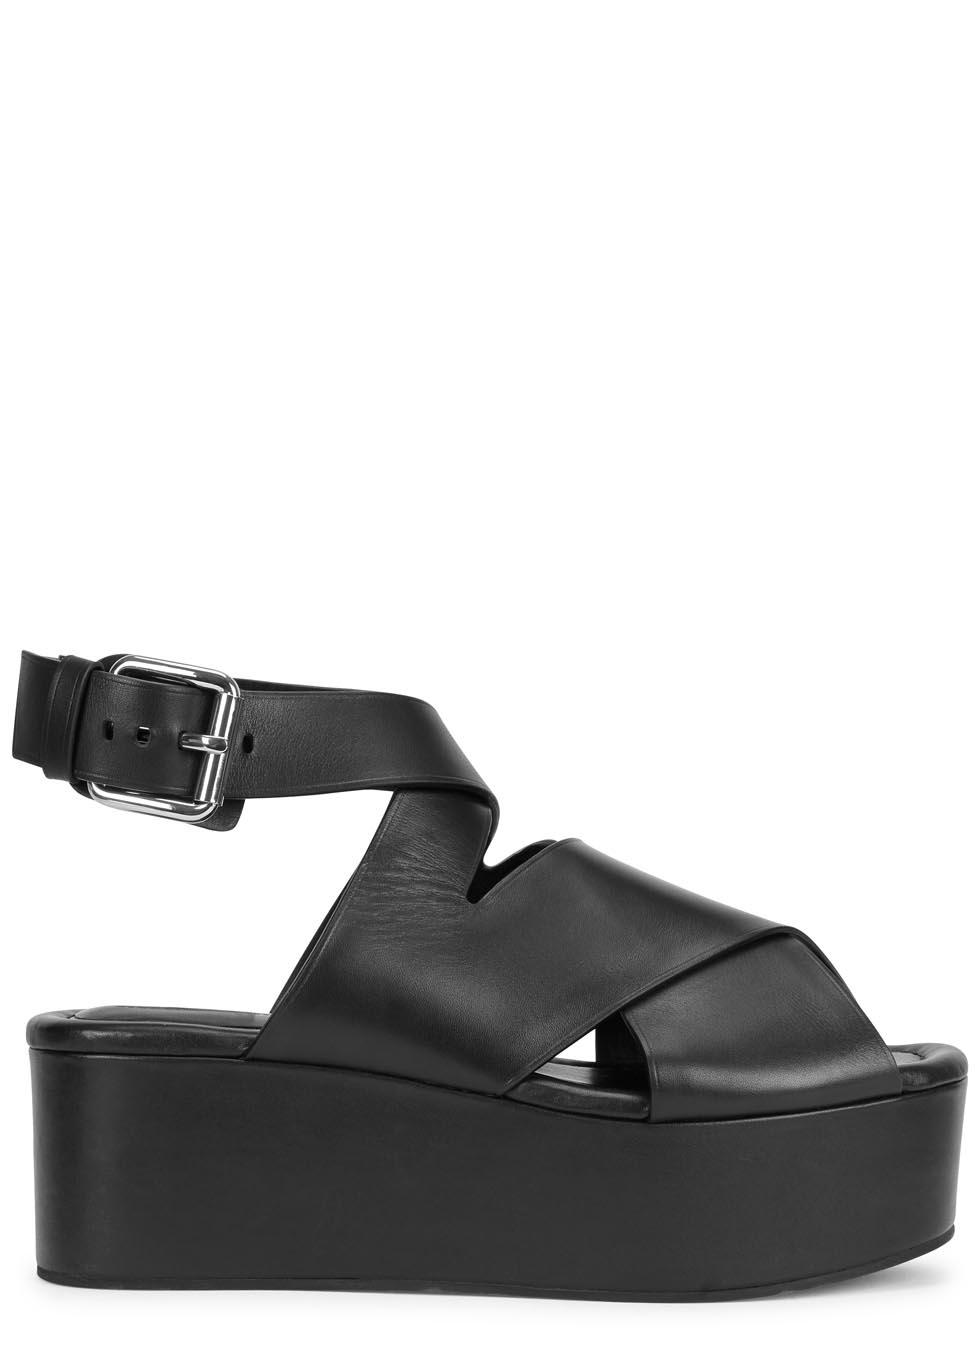 0d431adaaf9 Alexander Wang Rudy Black Leather Flatform Sandals in Black - Lyst